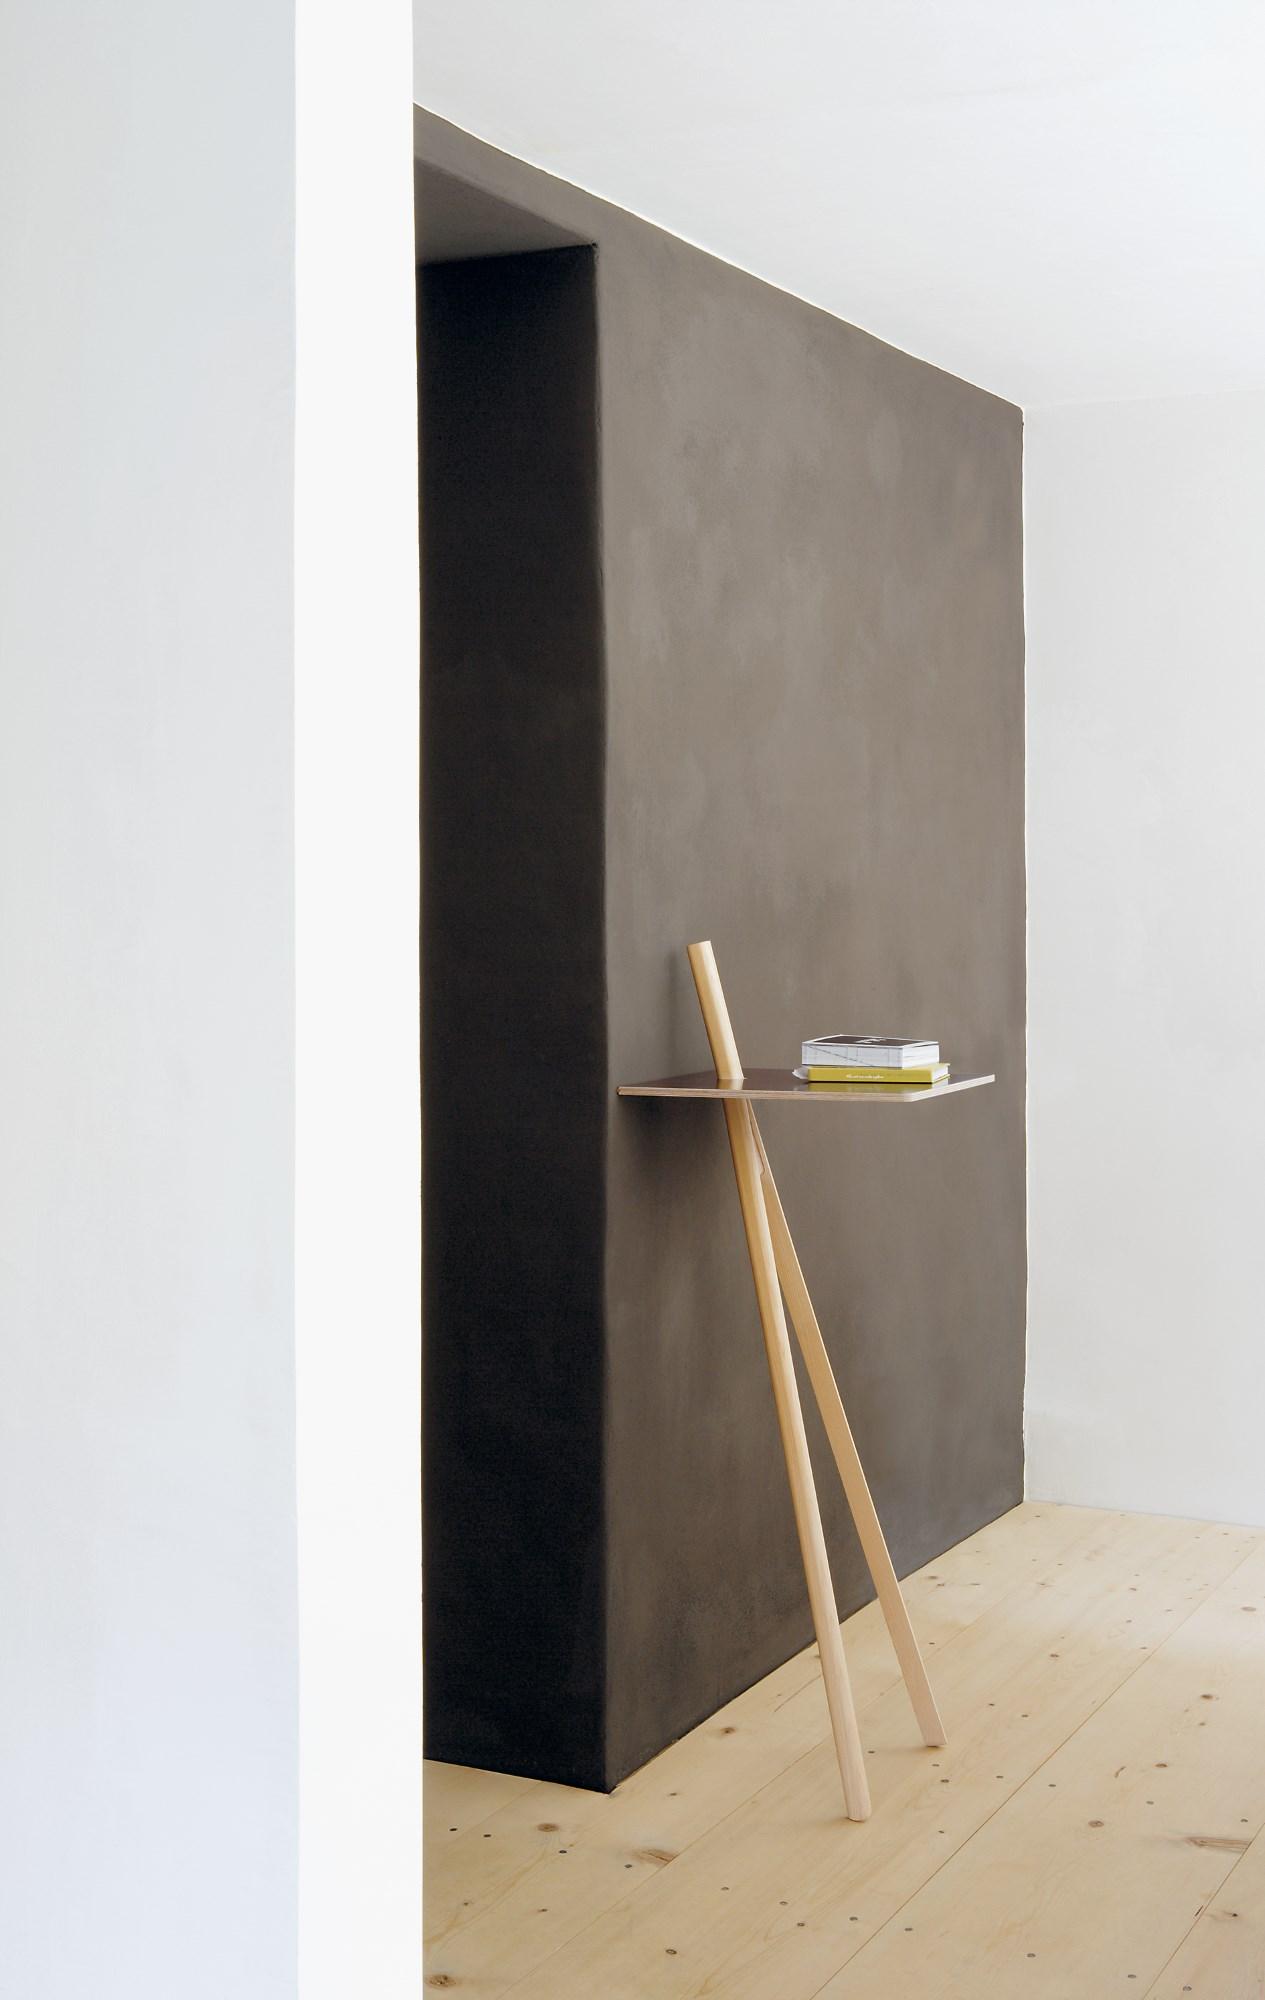 Der kleine Lehner Stehpult Nils Holger Moormann